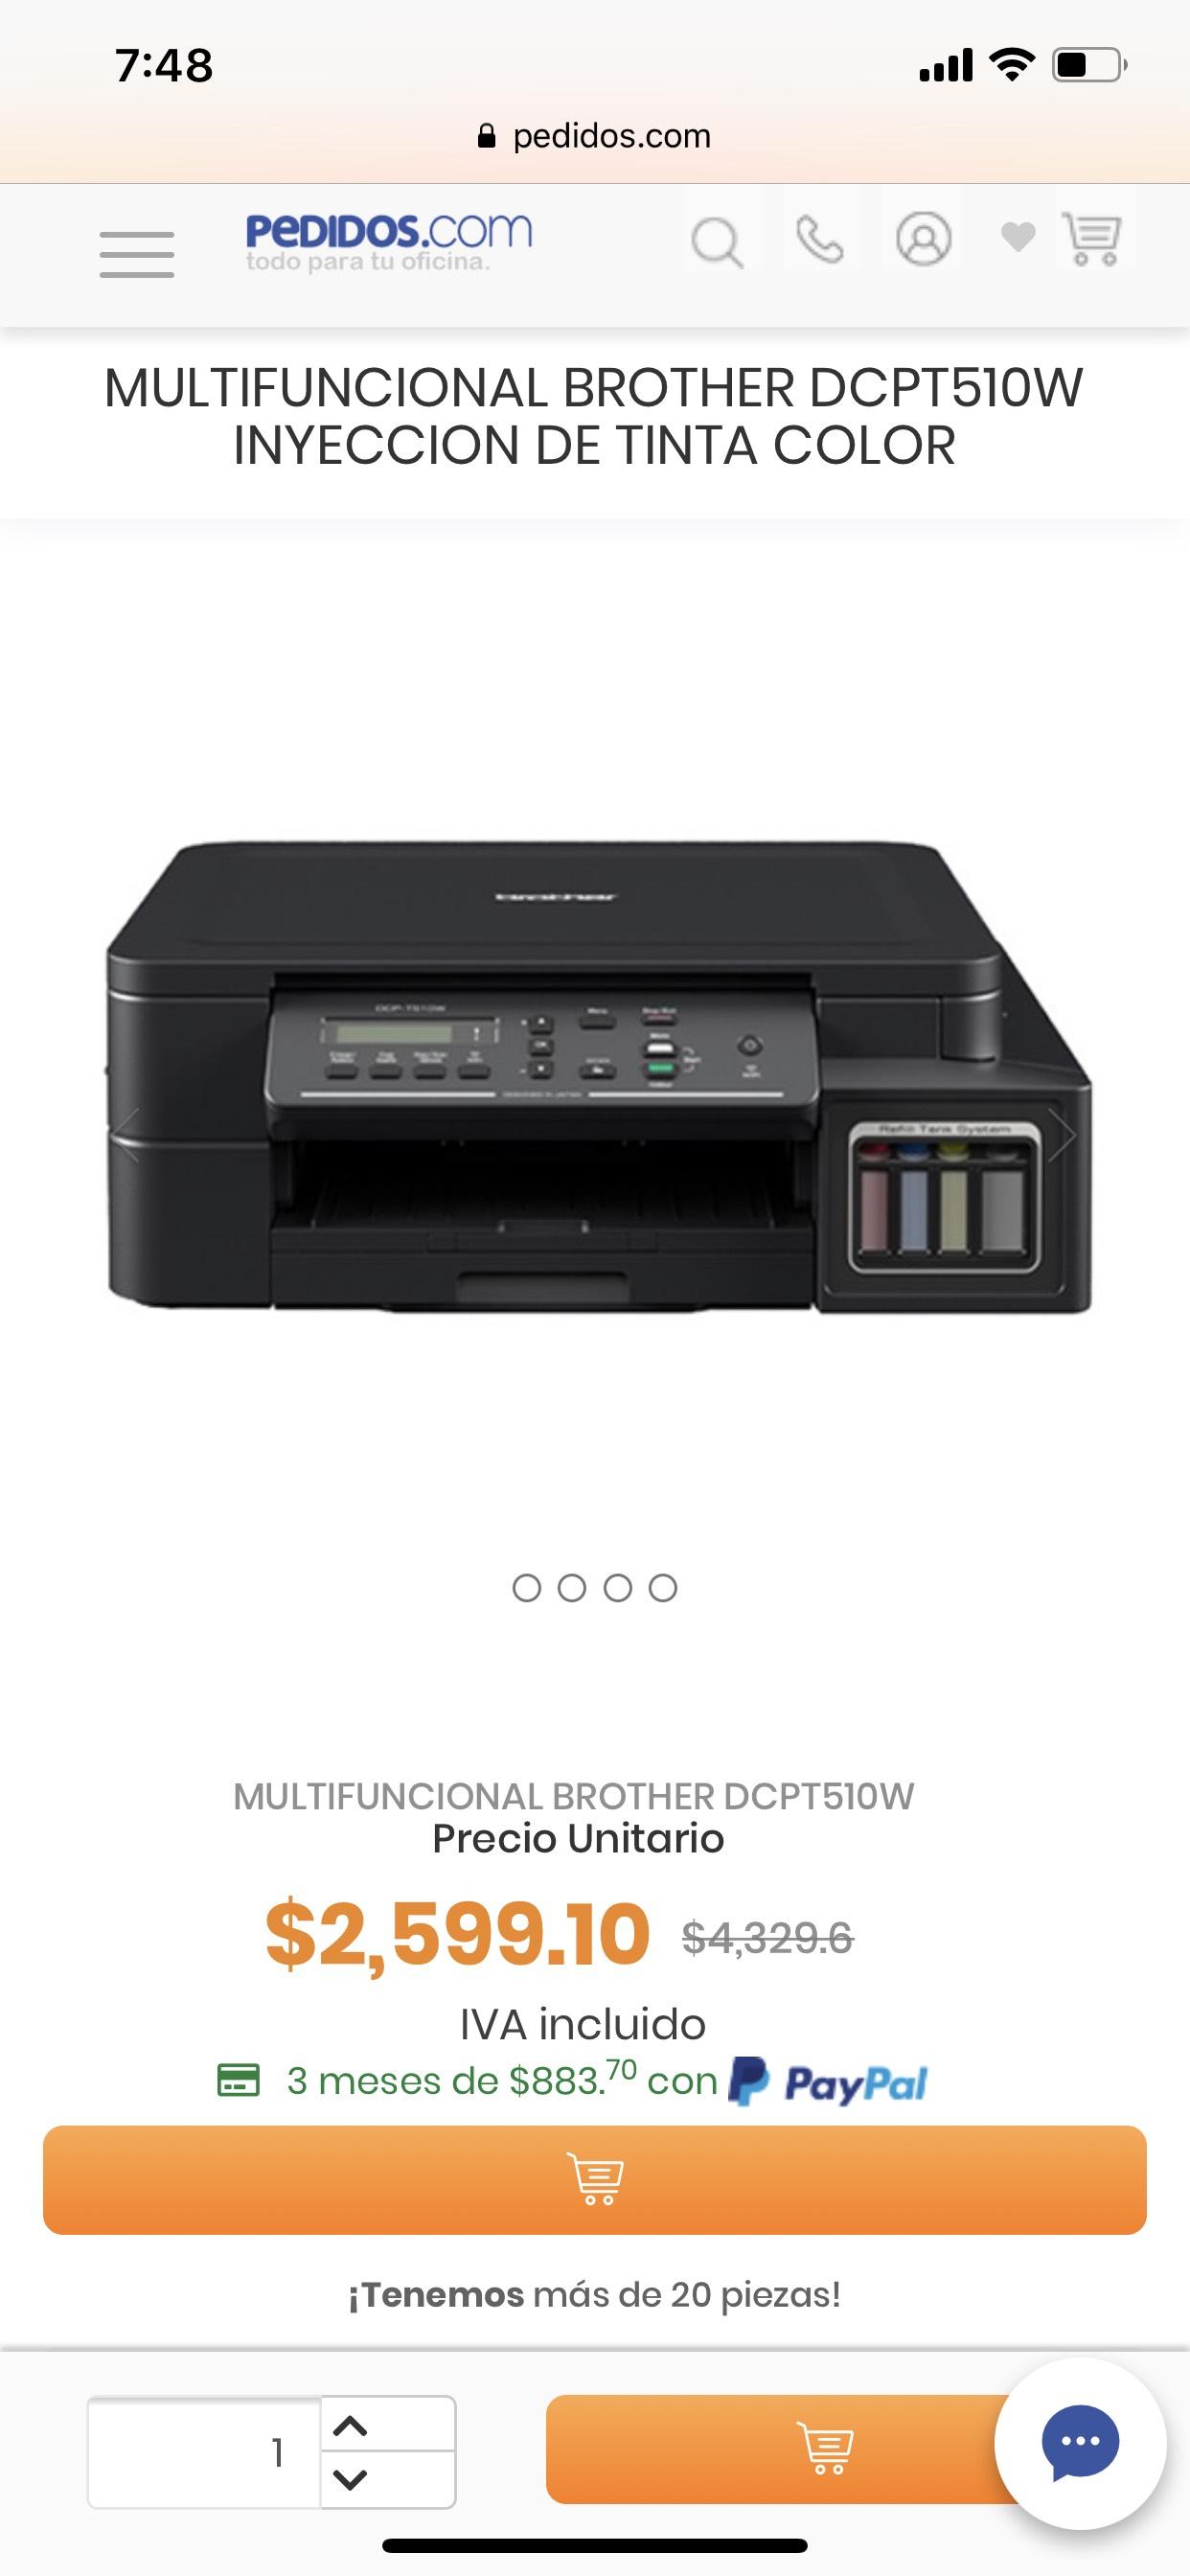 Pedidos.com: Multifuncional brother DCP-T510w sistema tinta continua wifi y AirPrint